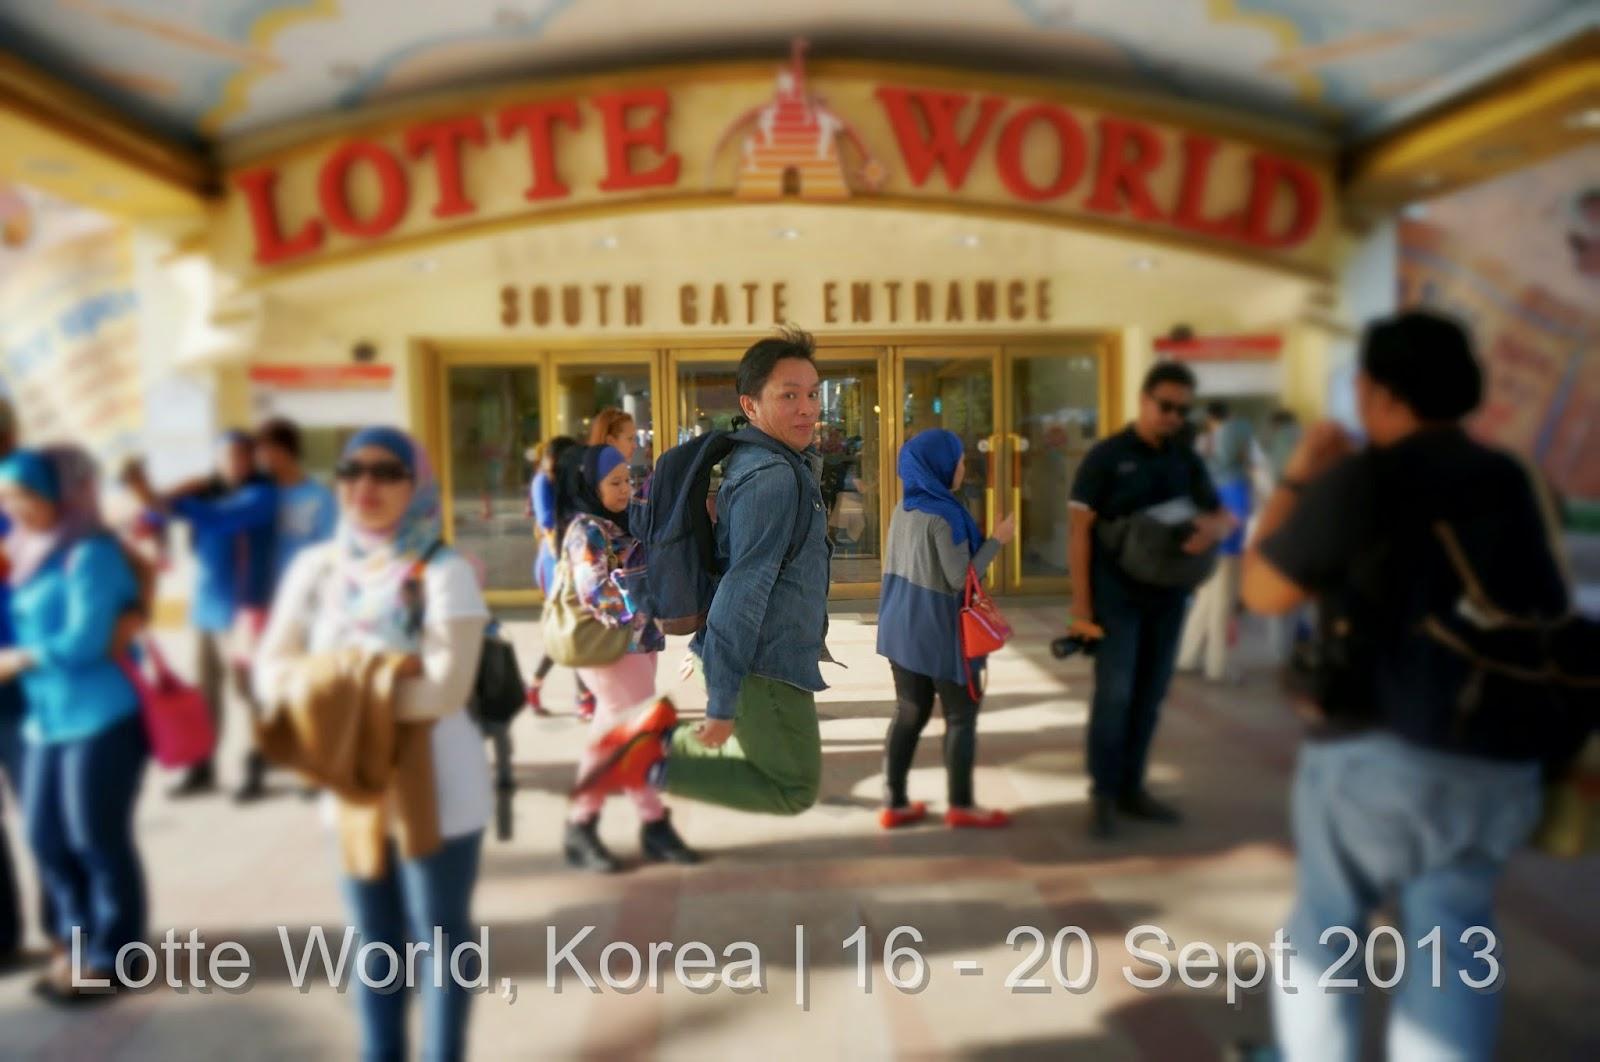 free trips, GLAMpreneur, Hanis Haizi Protege, extra income, big bonus, korea selatan, byrawlins